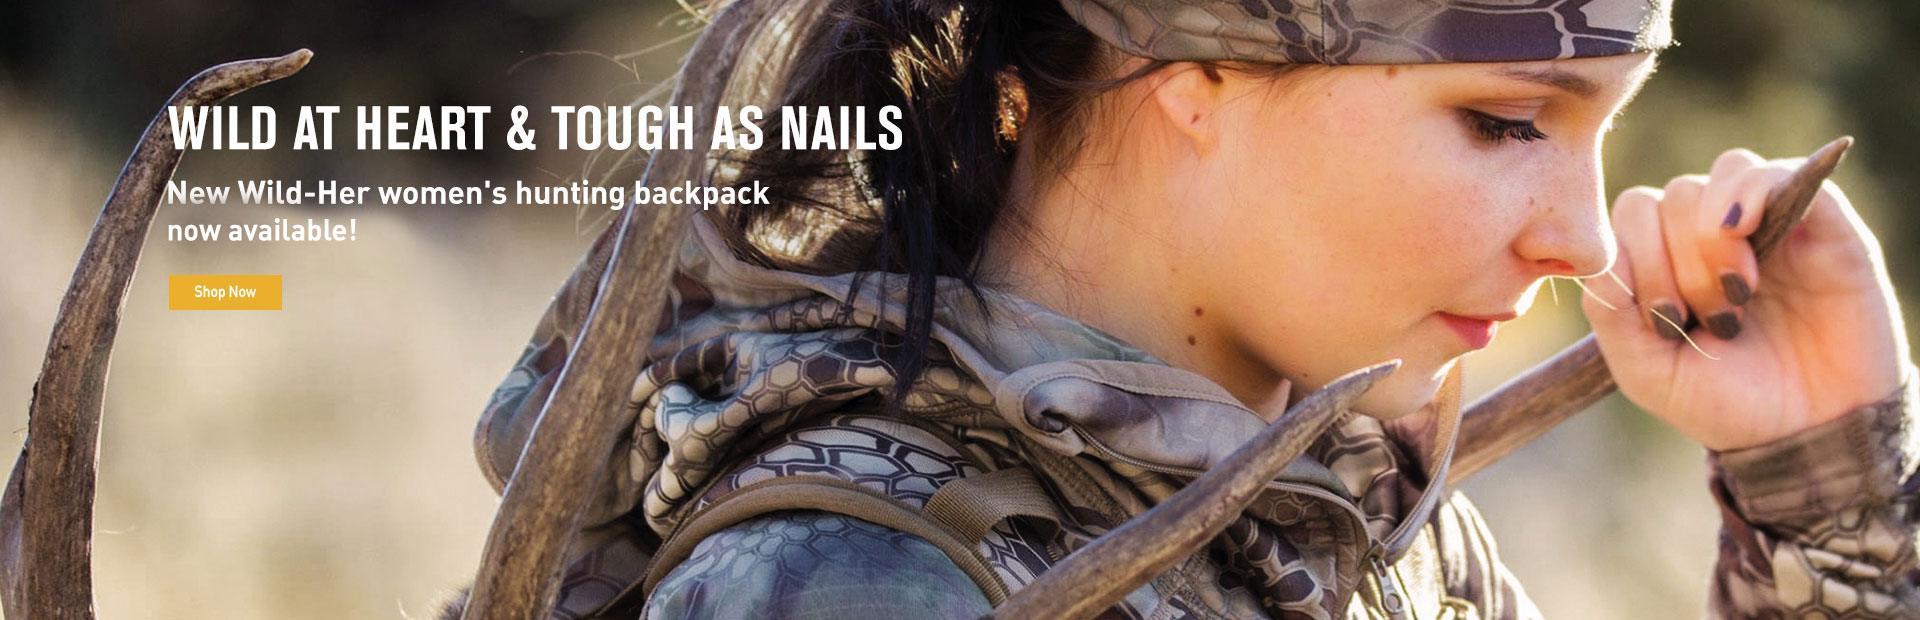 New Wild-Her Women's Hunting Pack